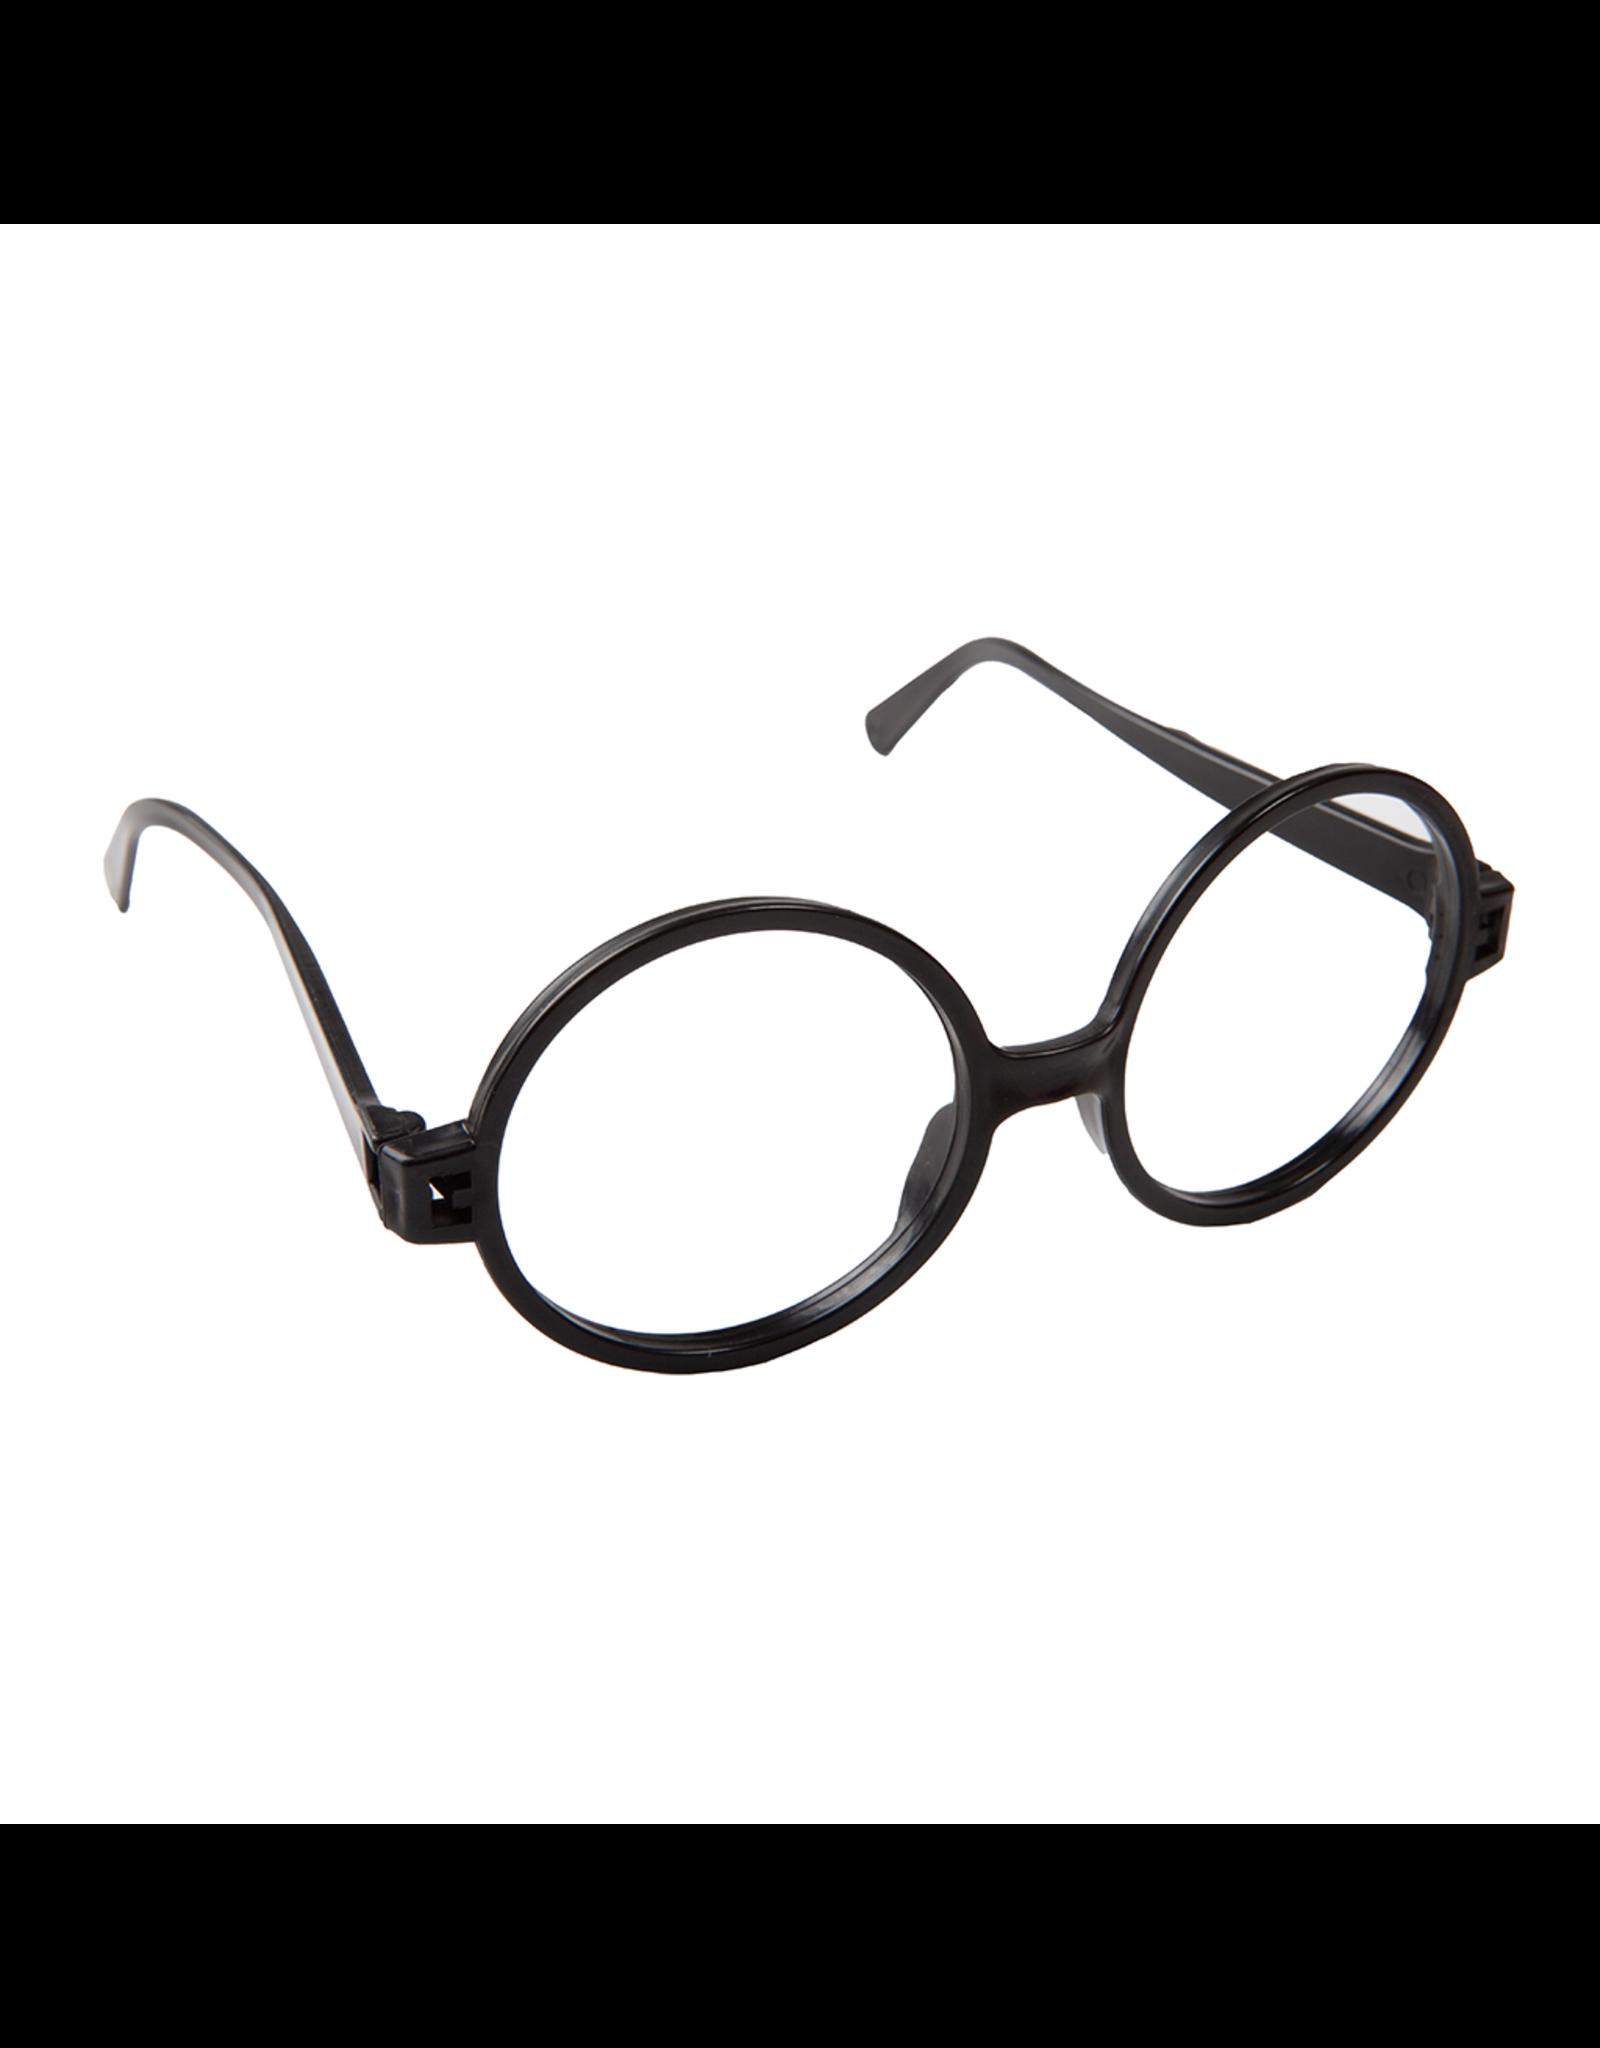 Great Pretenders Wizard Cloak & Glasses, Size 7-8